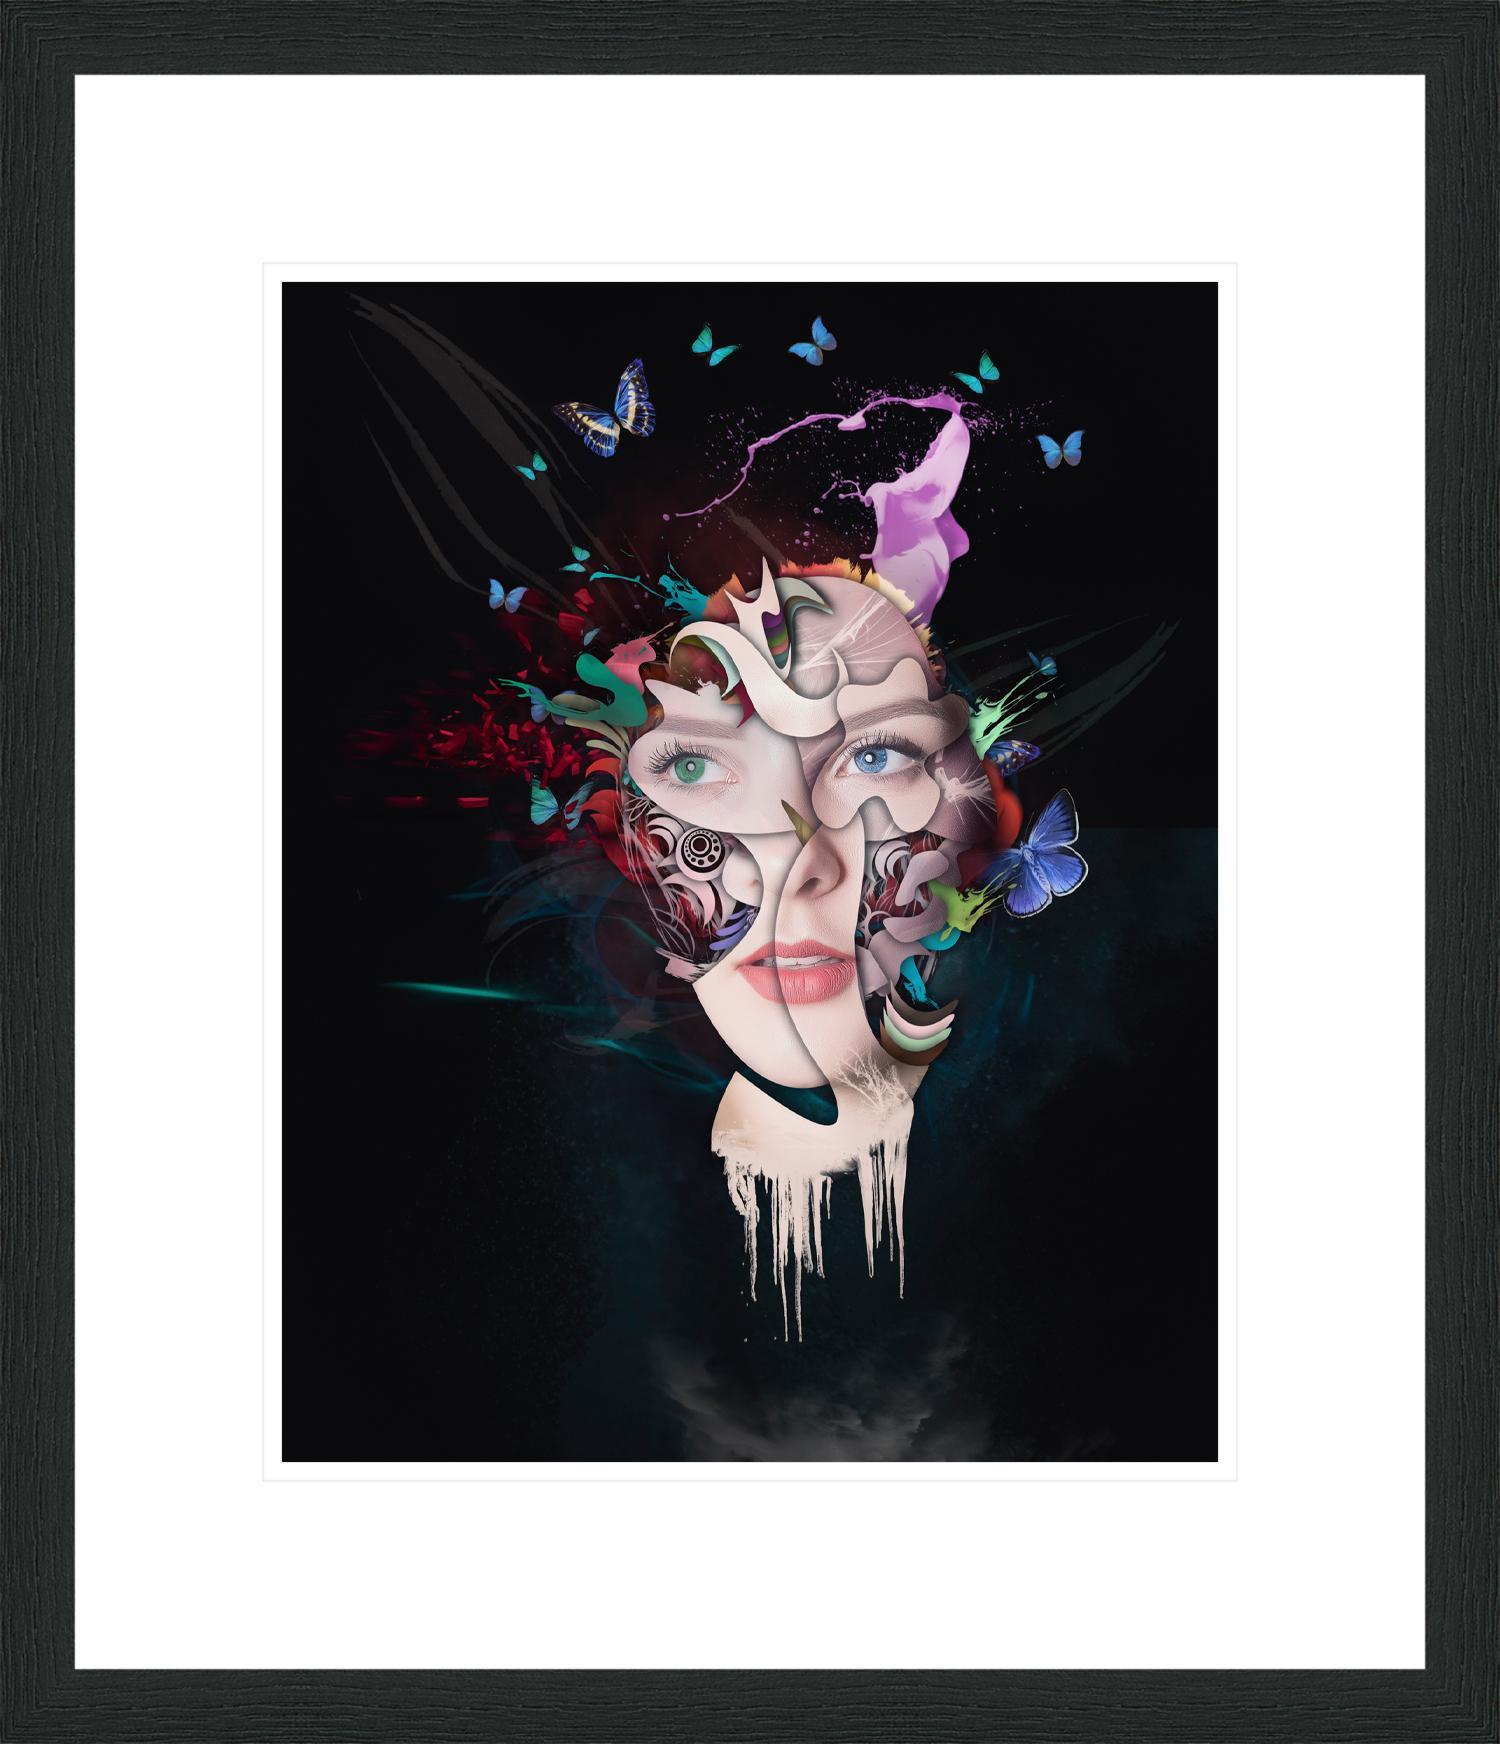 Abstract Portrait No 17 - Erik Brede